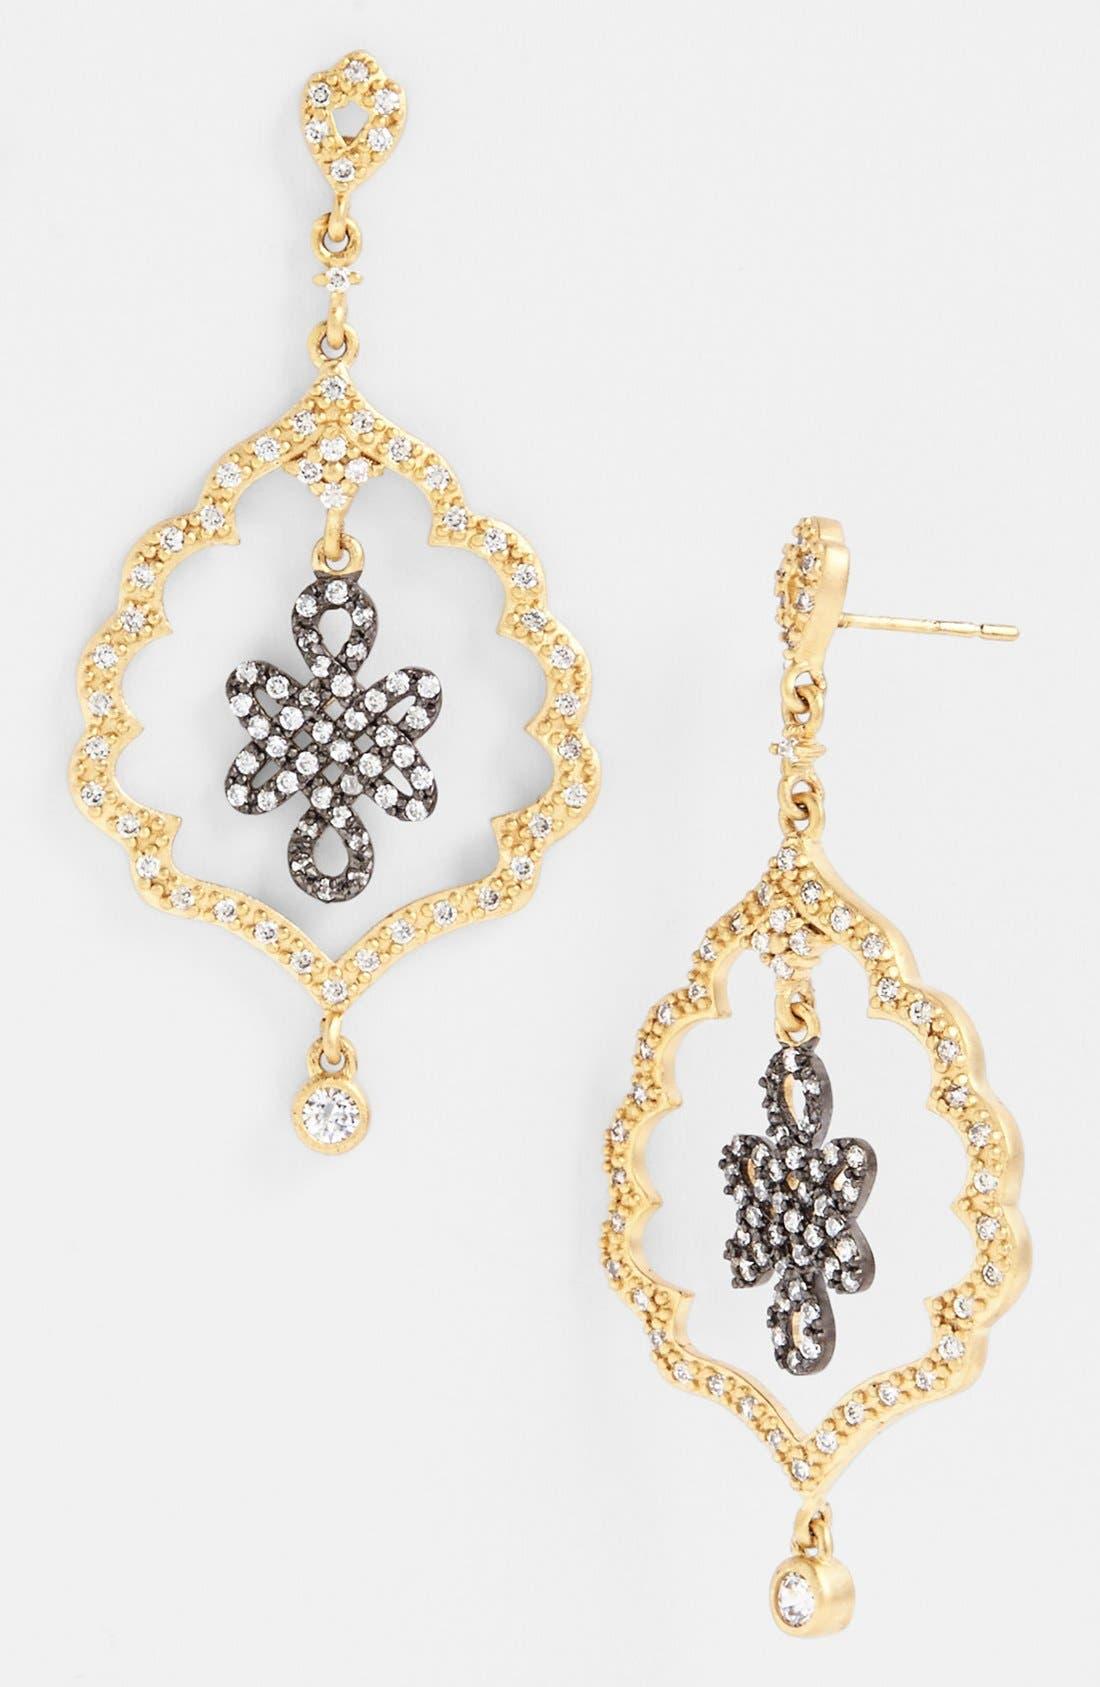 Main Image - FREIDA ROTHMAN 'Gramercy' Love Knot Drop Earrings